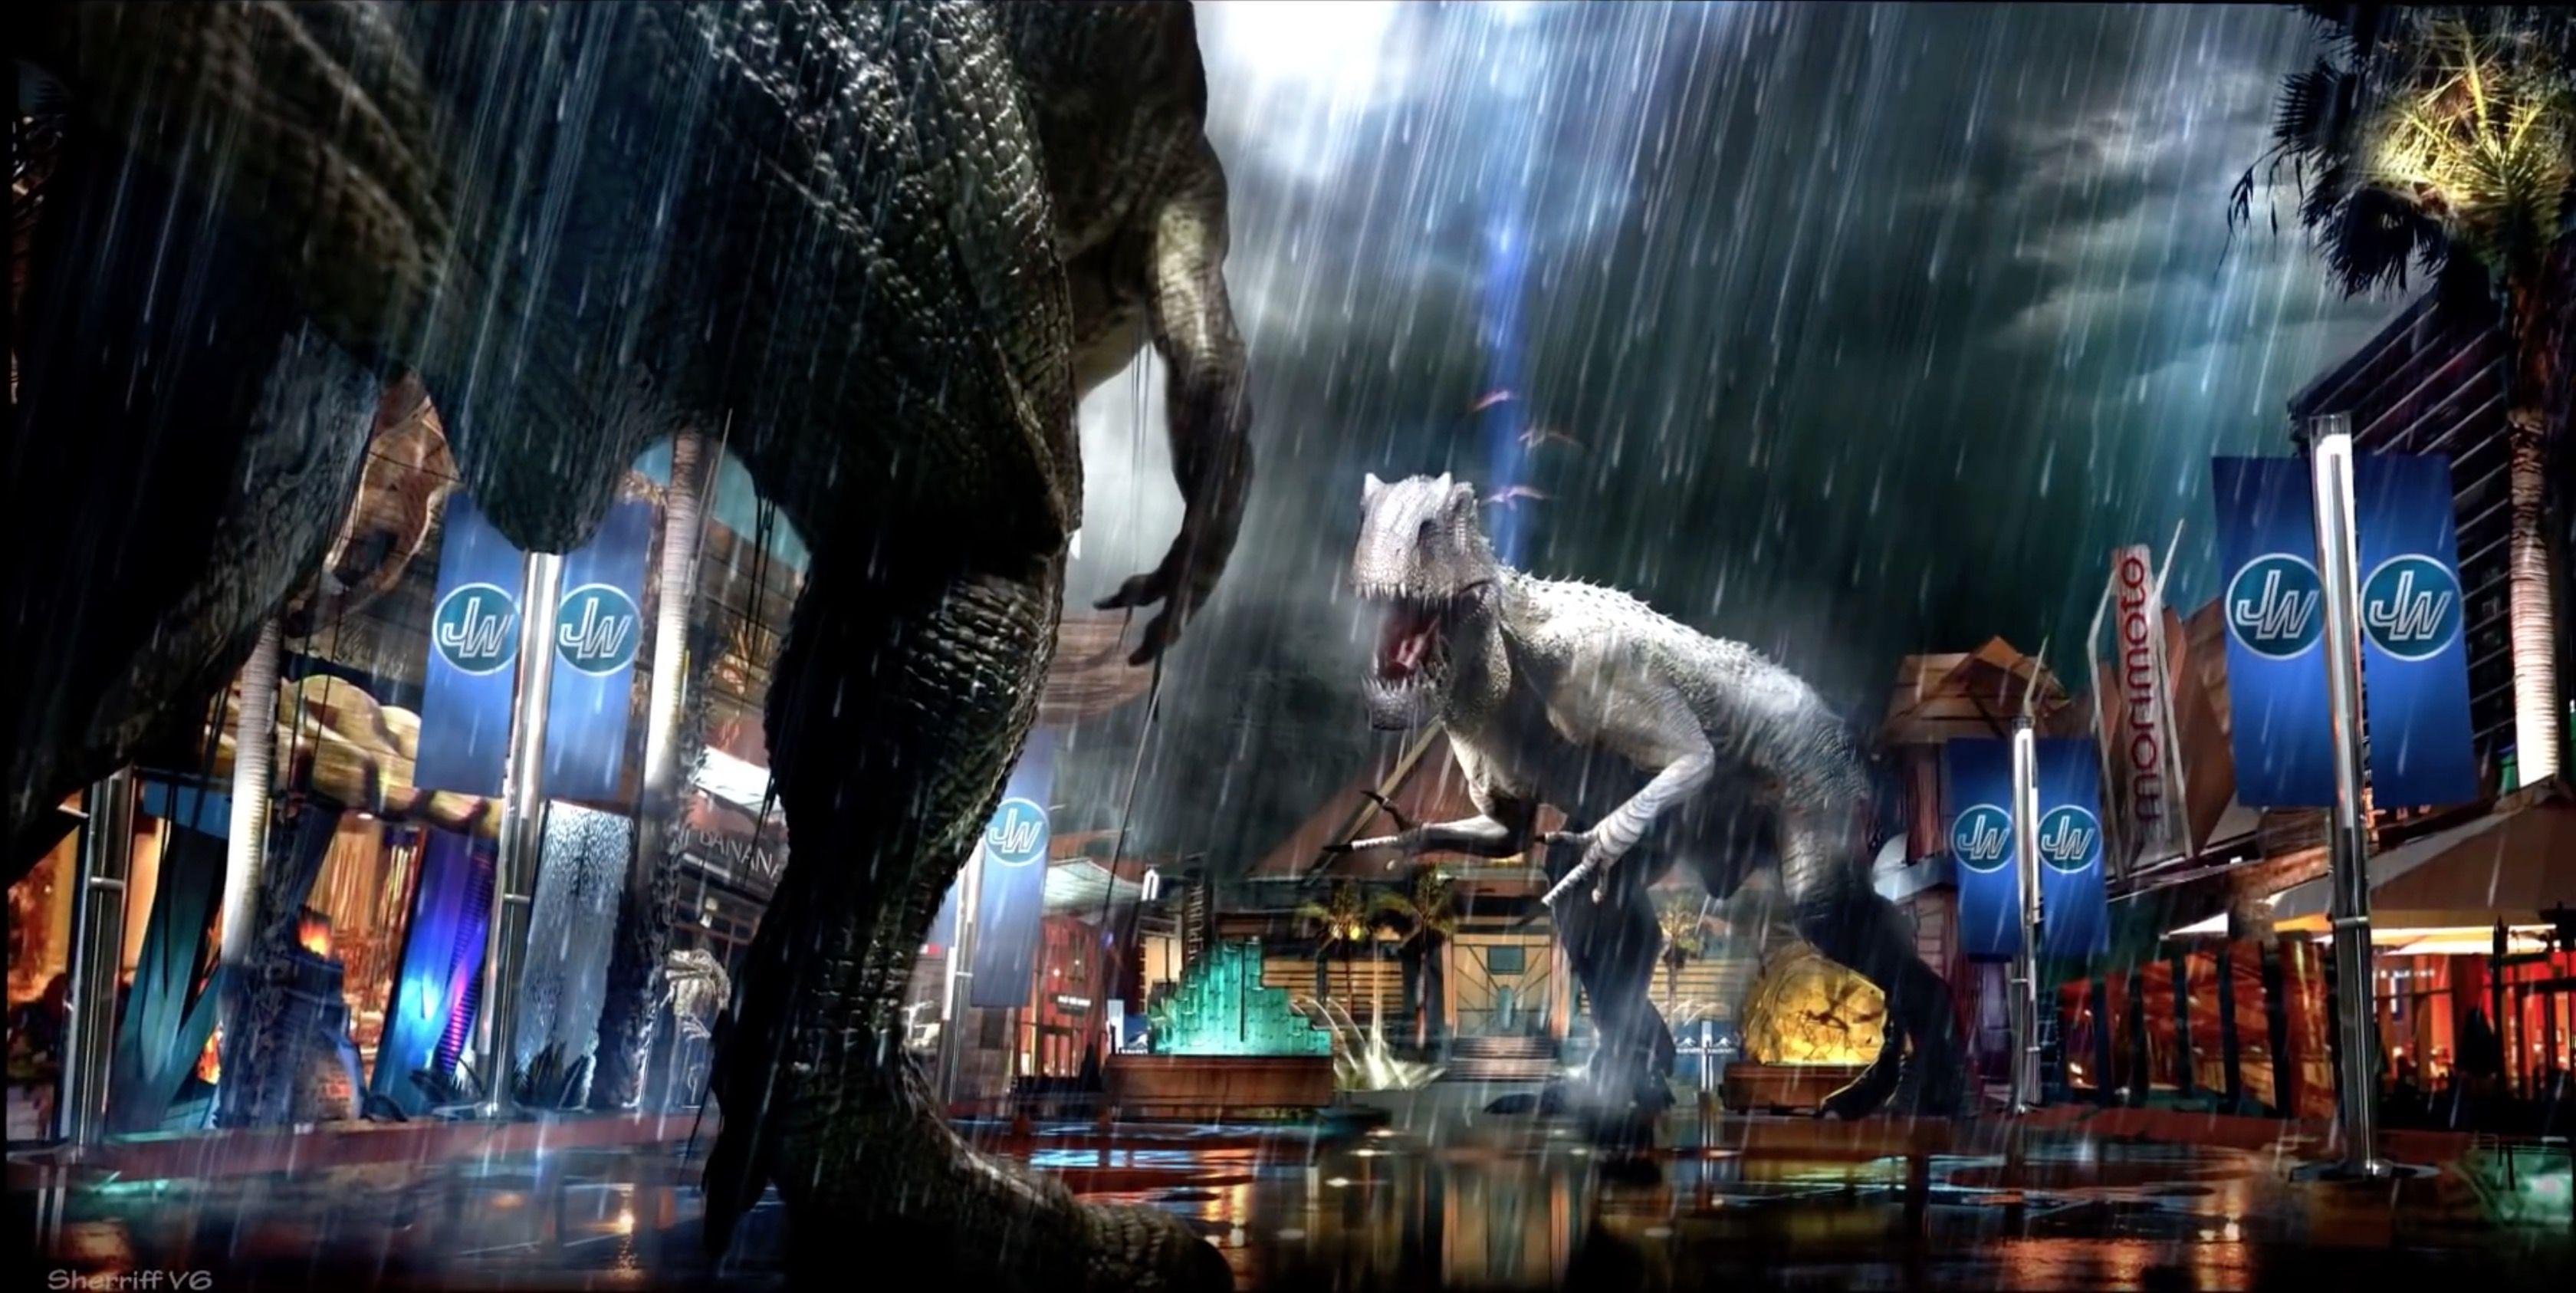 Jurassic World From Concept Art To Vfx Con Imagenes Parque